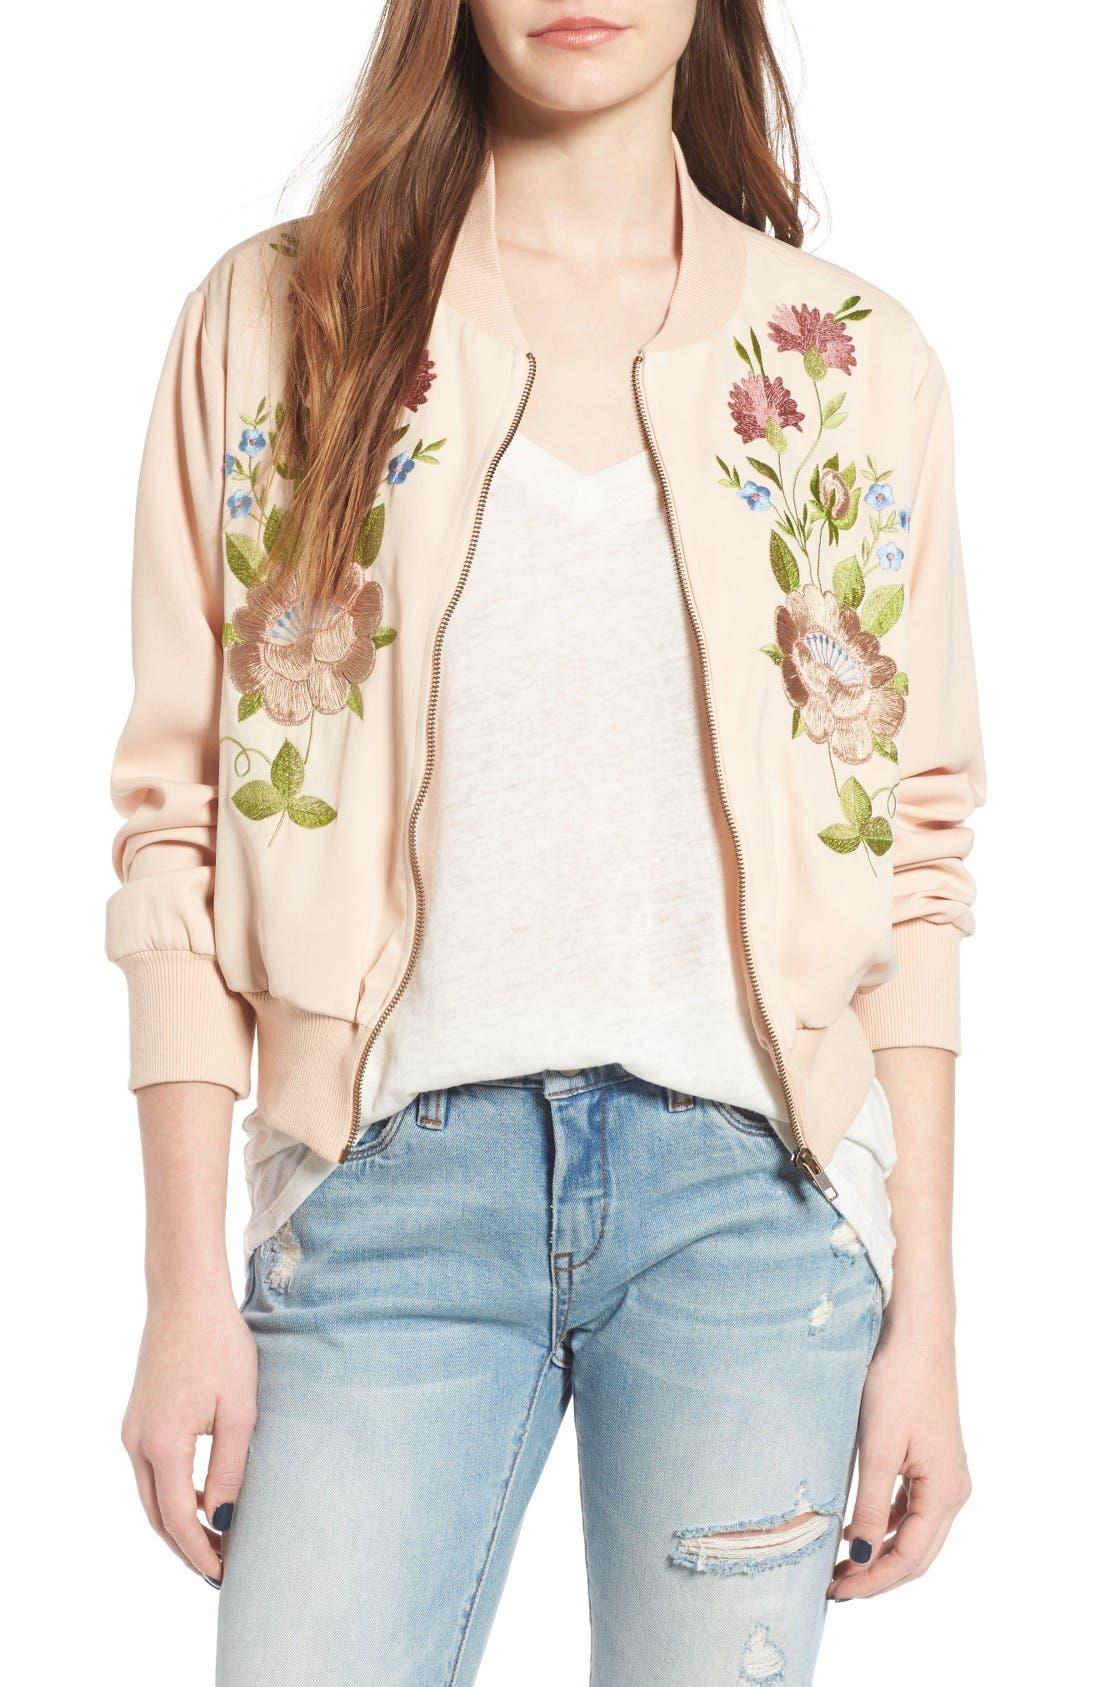 Alternate Image 1 Selected - Glamorous Floral Embroidered Bomber Jacket